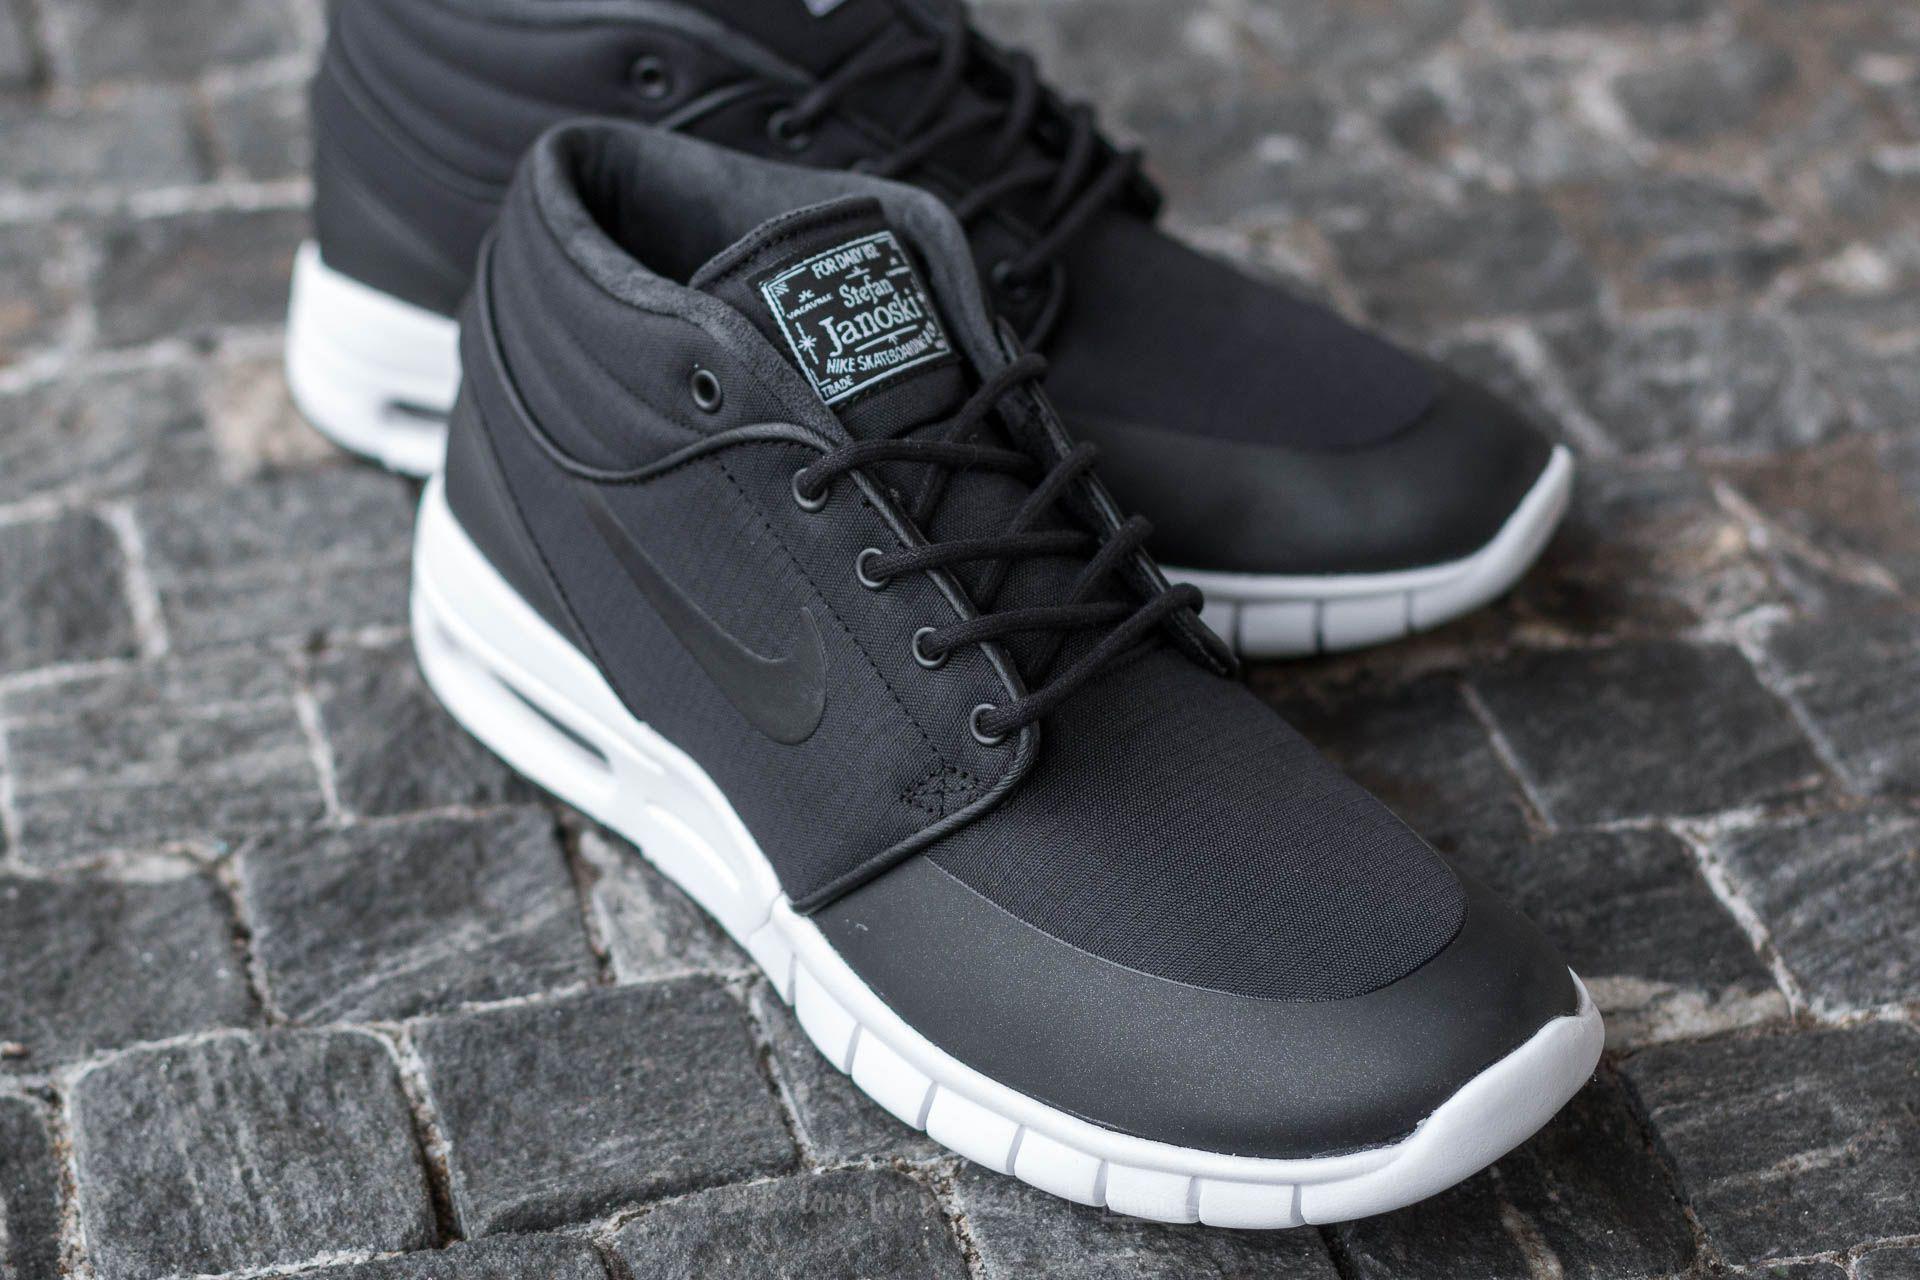 17739ea385df Lyst - Nike Stefan Janoski Max Mid Black  Black-metallic Silver in ...